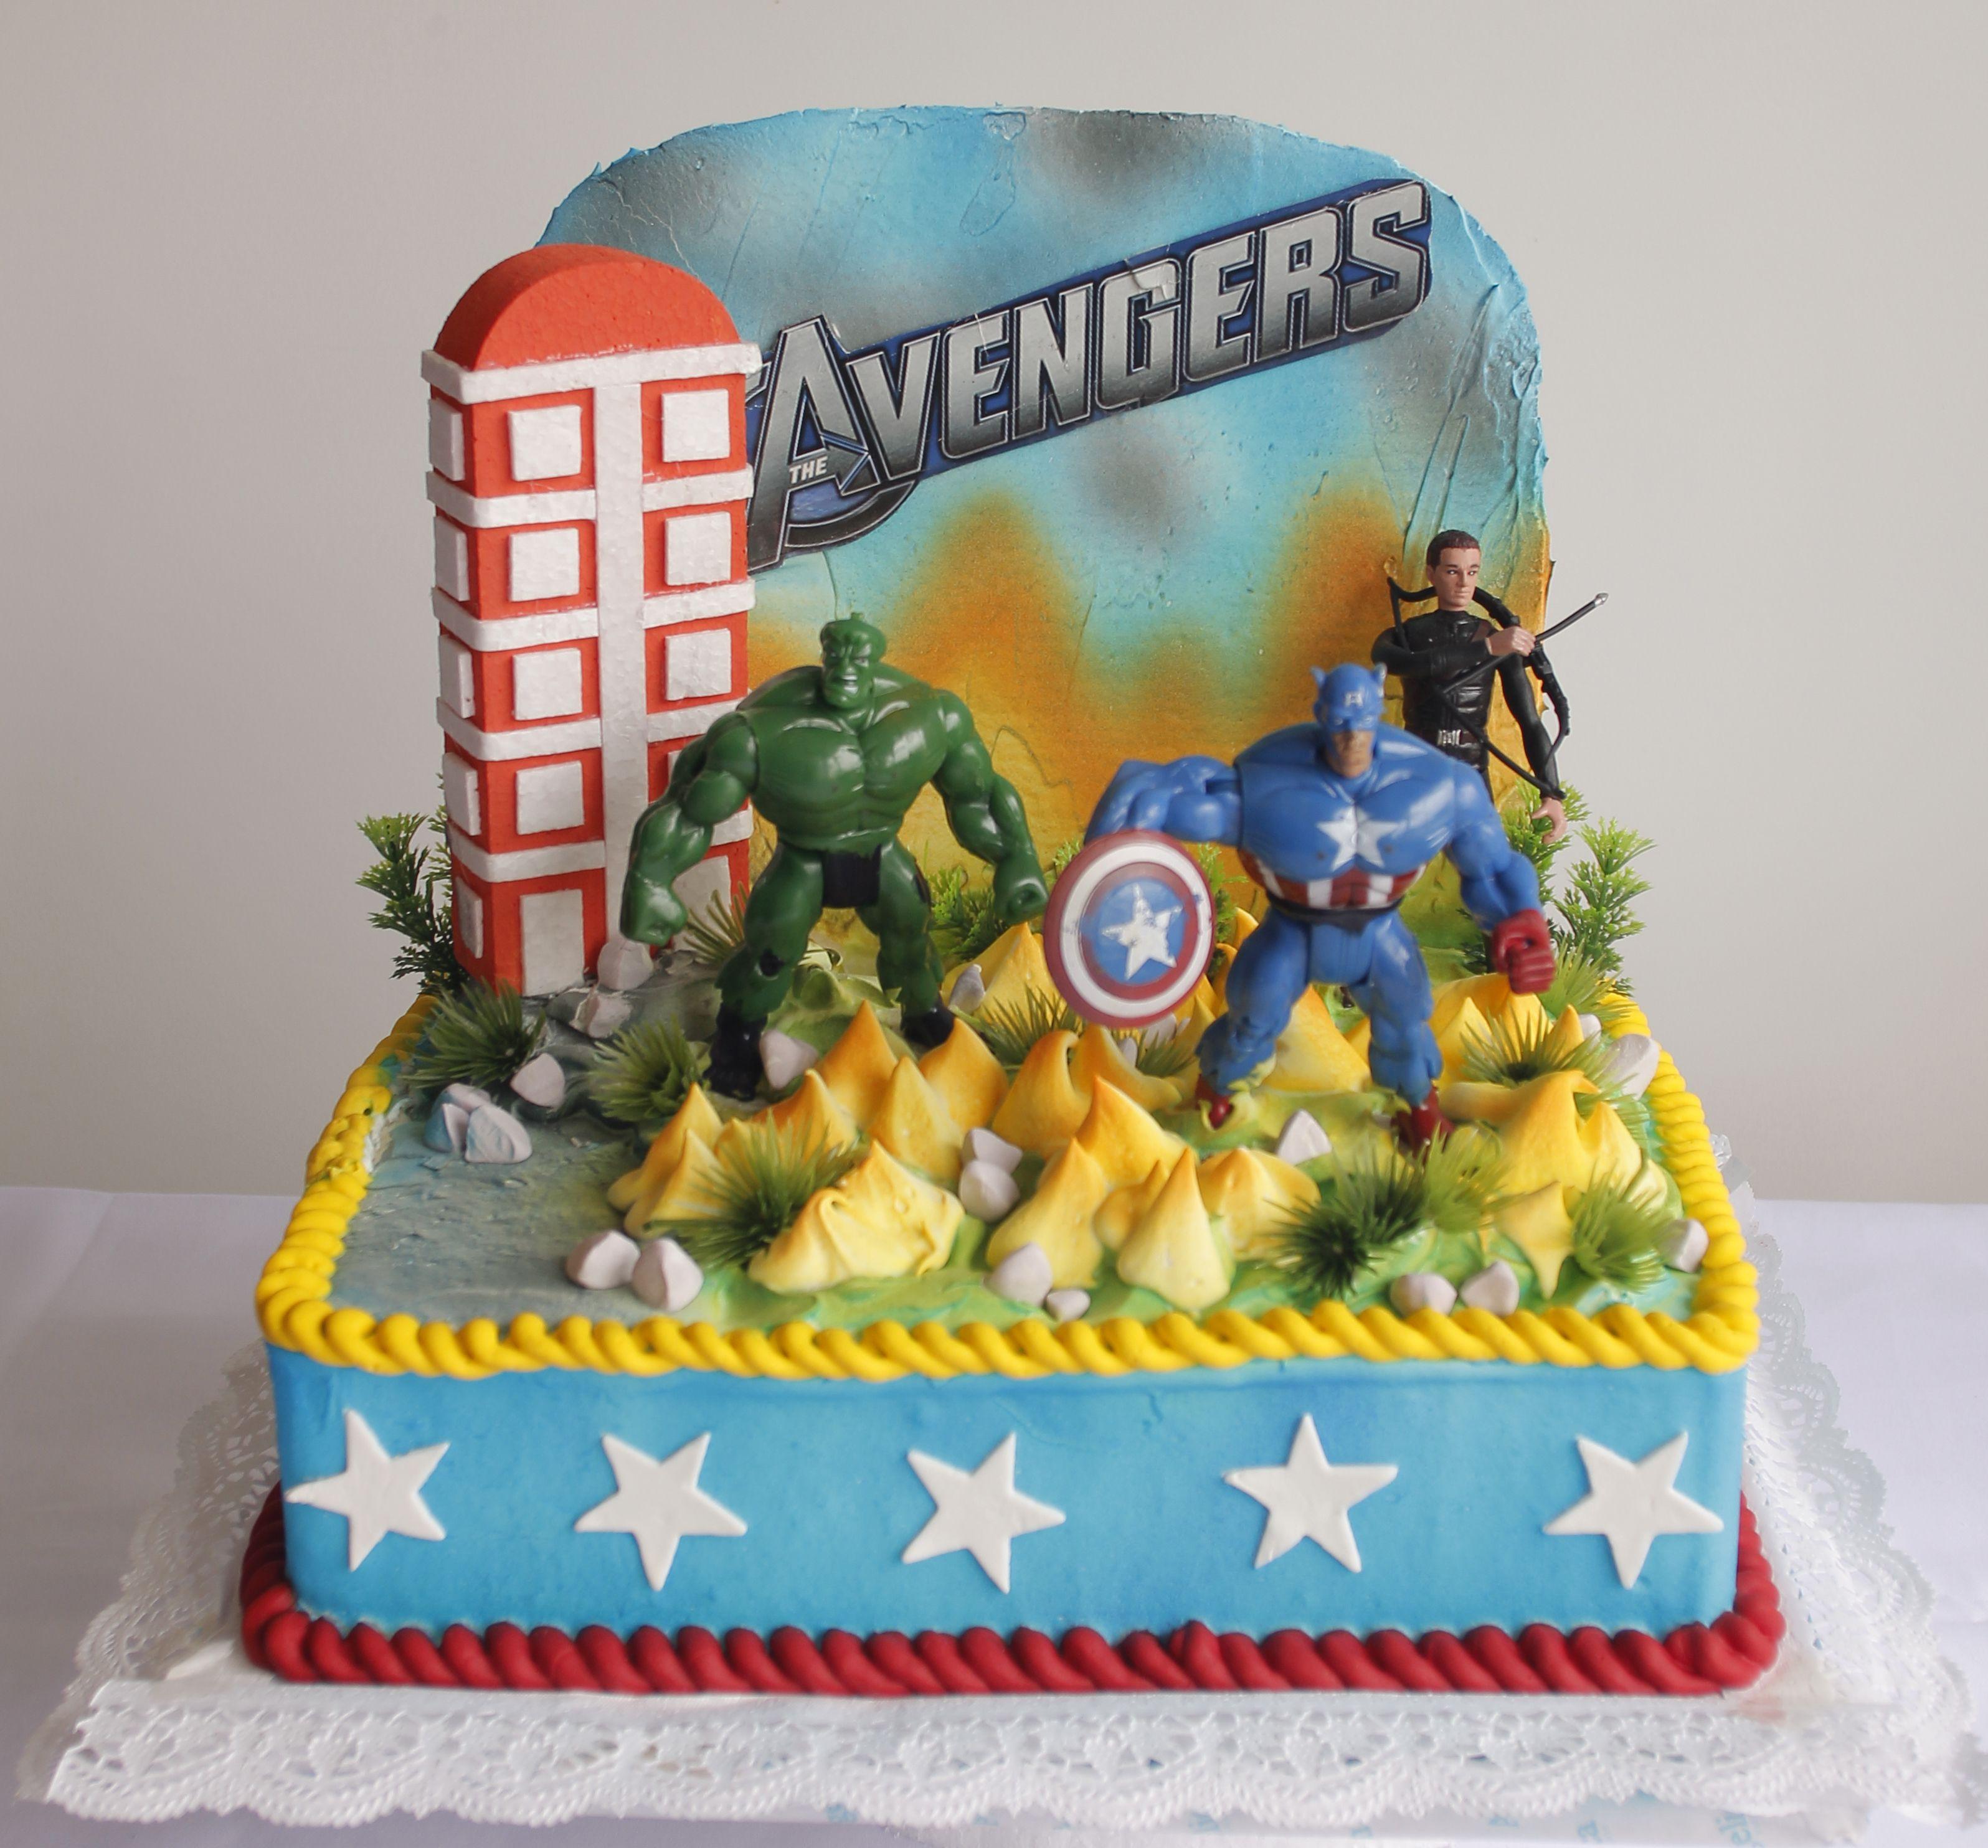 The Avenger big toys Angelica Bakeshop Cebu KIDS Cake with Toy